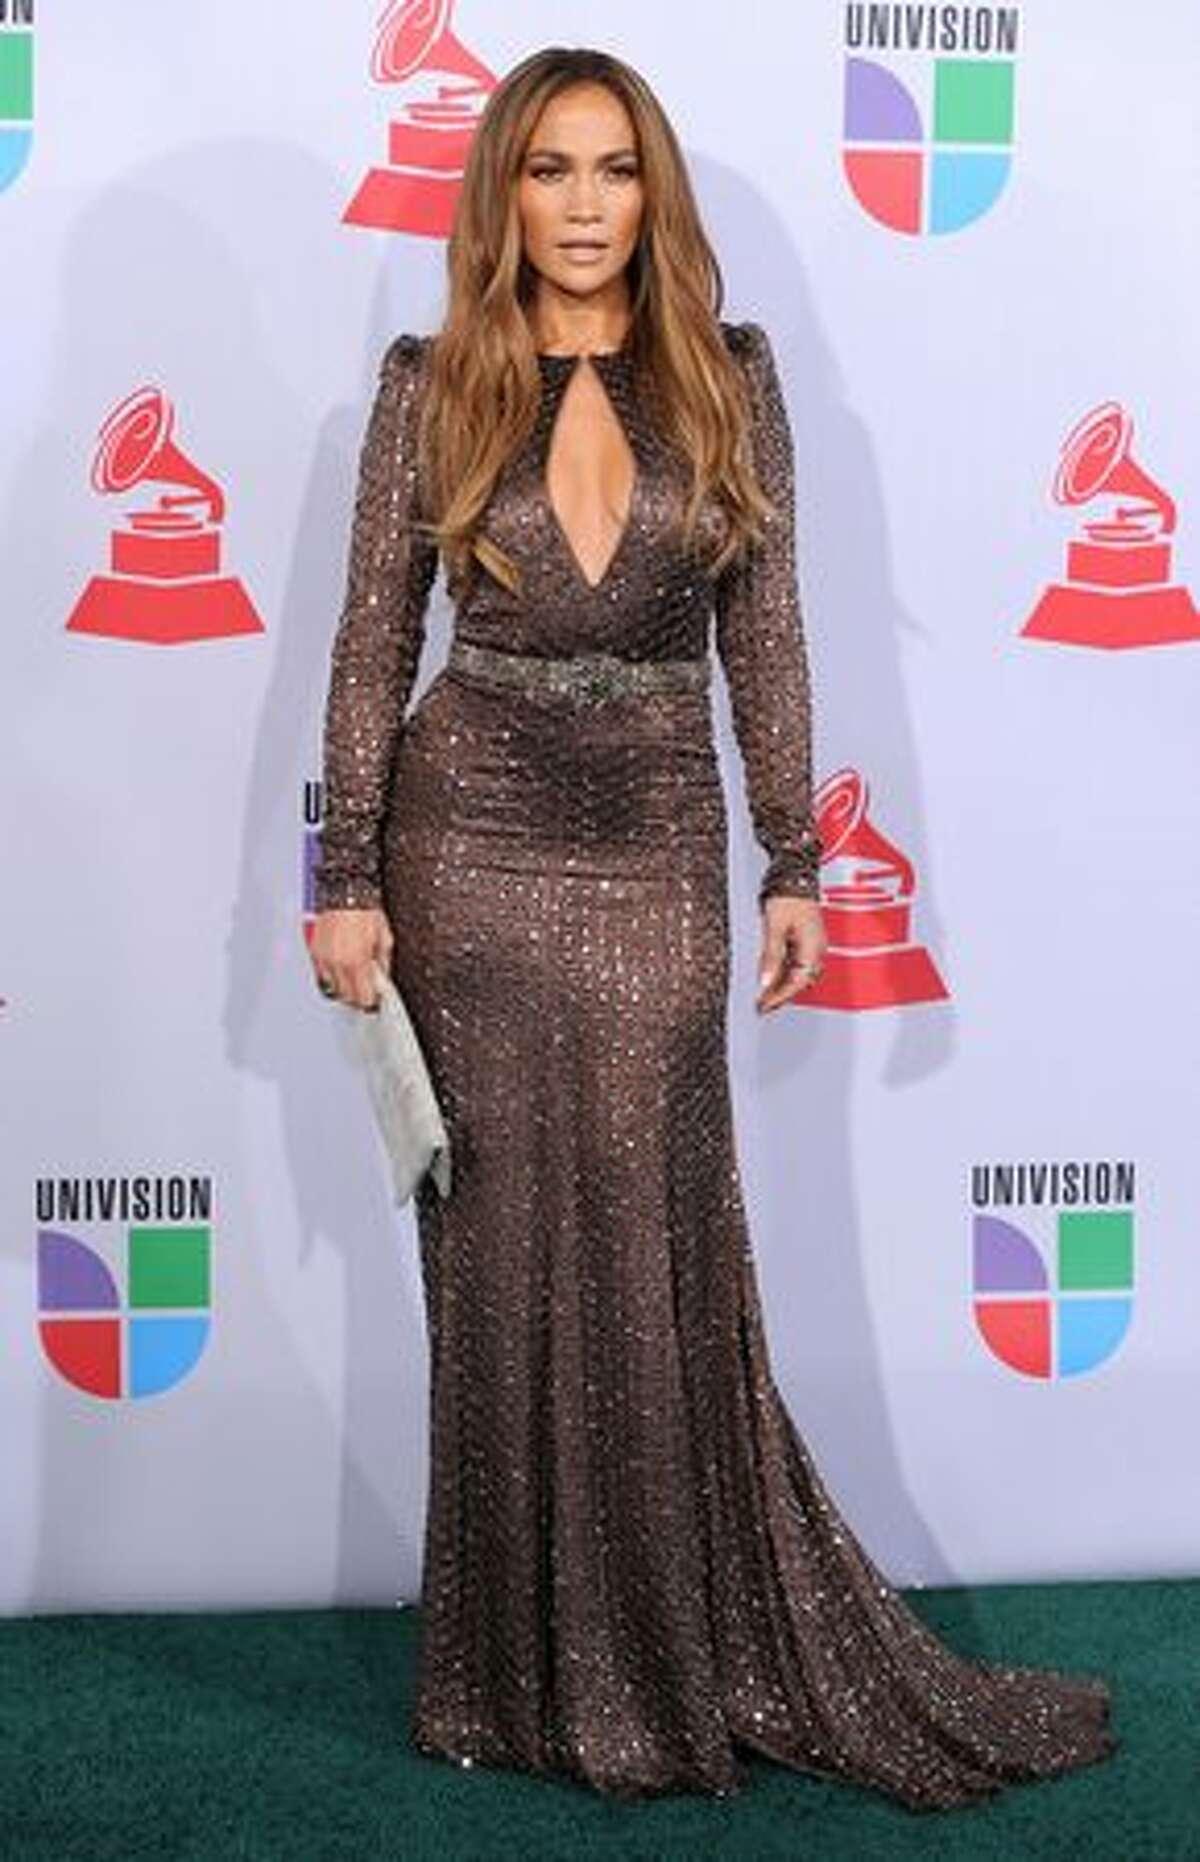 Actress Jennifer Lopez arrives at the 11th annual Latin GRAMMY Awards at the Mandalay Bay Resort & Casino in Las Vegas, Nevada.